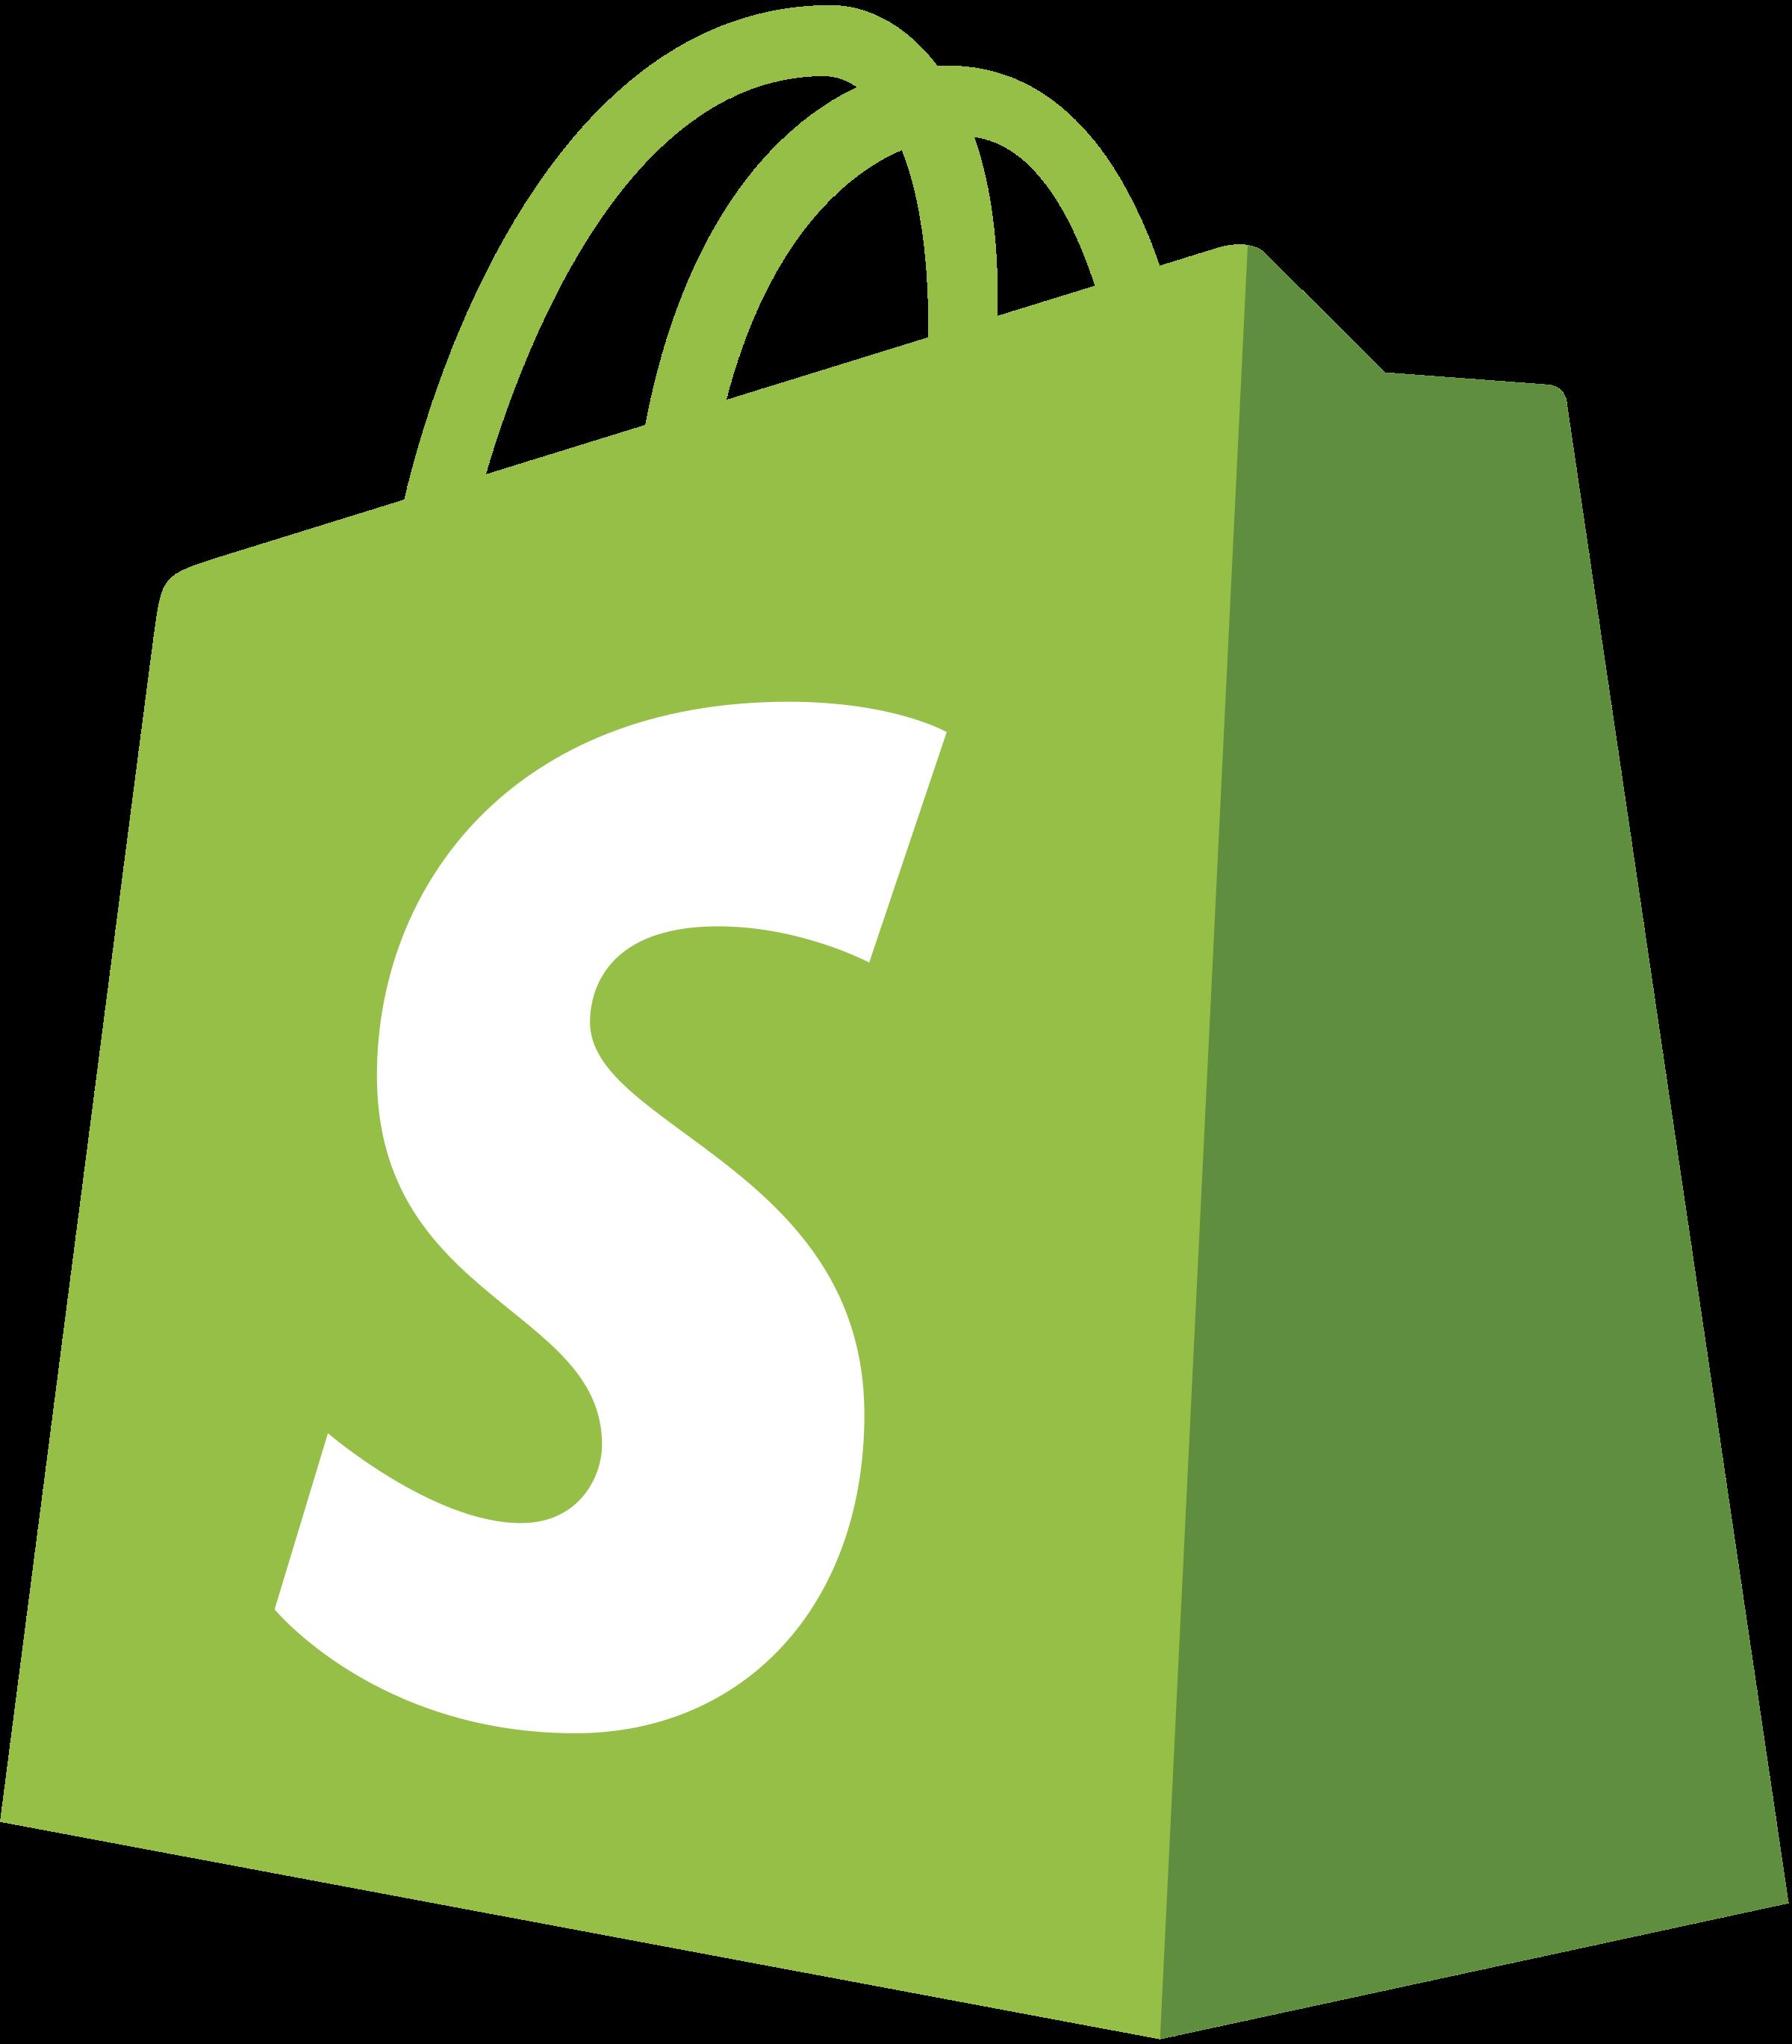 Shopify Logo PNG Transparent & SVG Vector - Freebie Supply